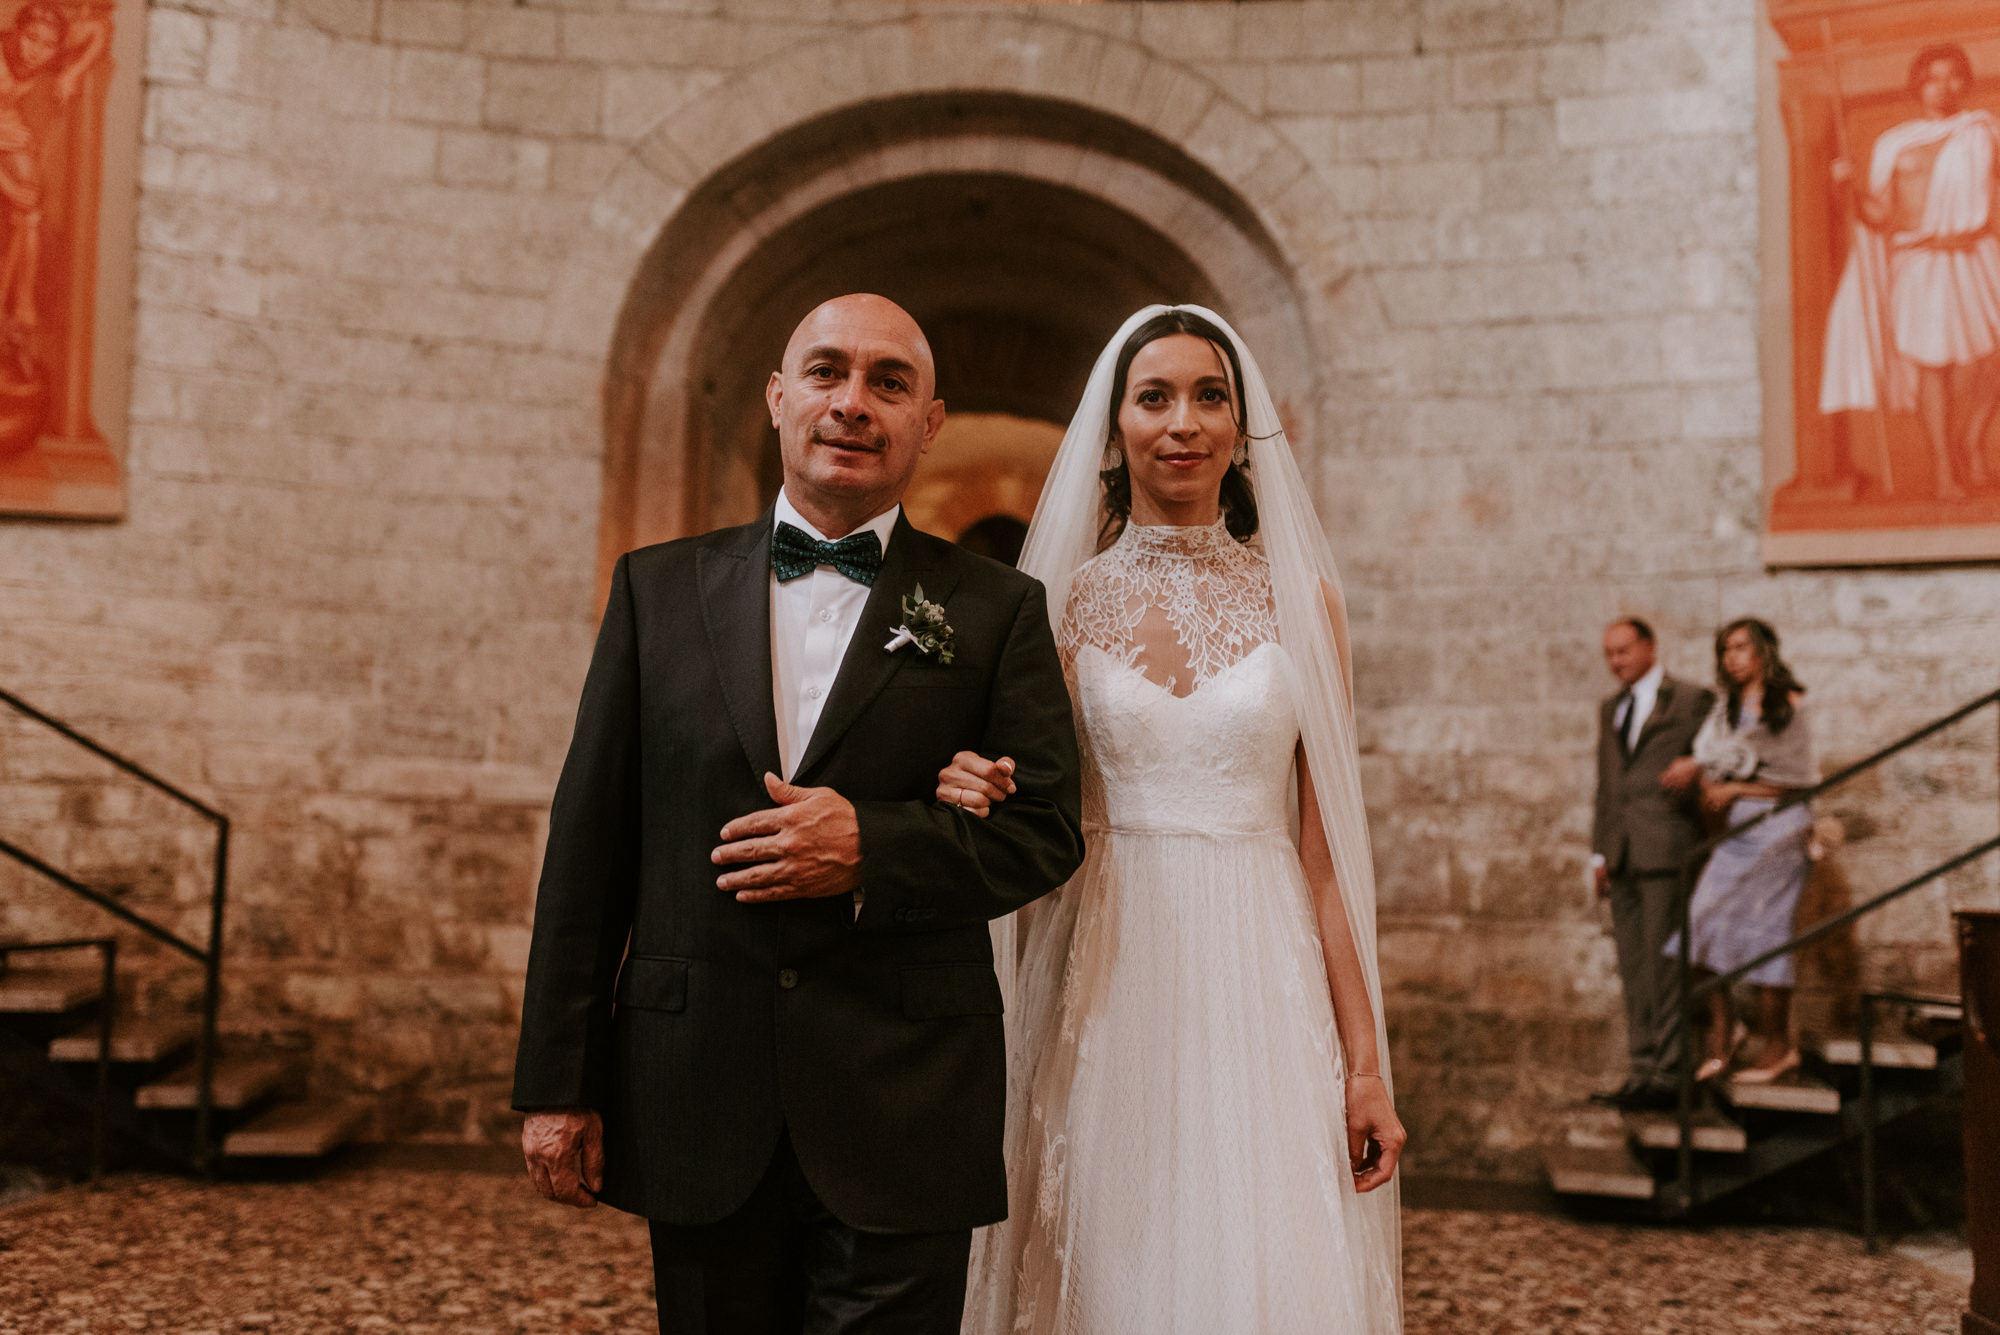 FOTO+PHOTO+BODA+WEDDING+ITALIA+ITALY+MAURICIO+GARAY+MAURICIOGARAY+WEDDINPHOTOGRAPHER+FOTOGRAFODEBODA-751.jpg